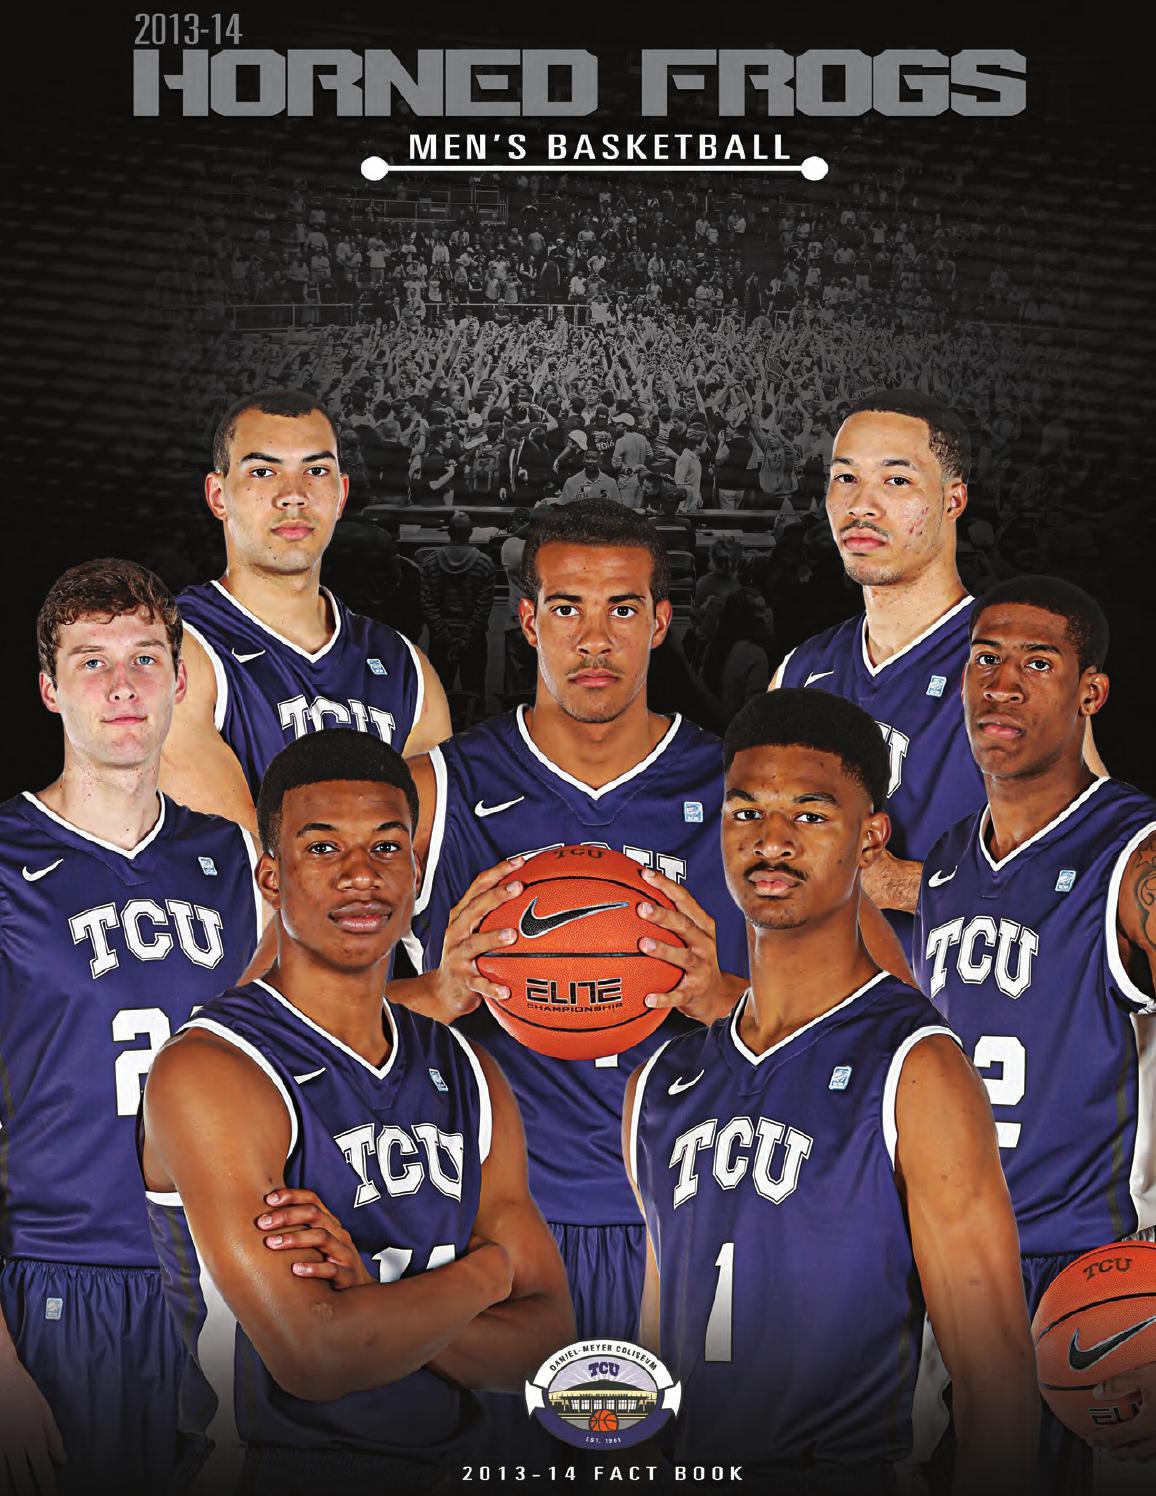 2013-14 TCU Men's Basketball Fact Book by TCU Athletics - Issuu